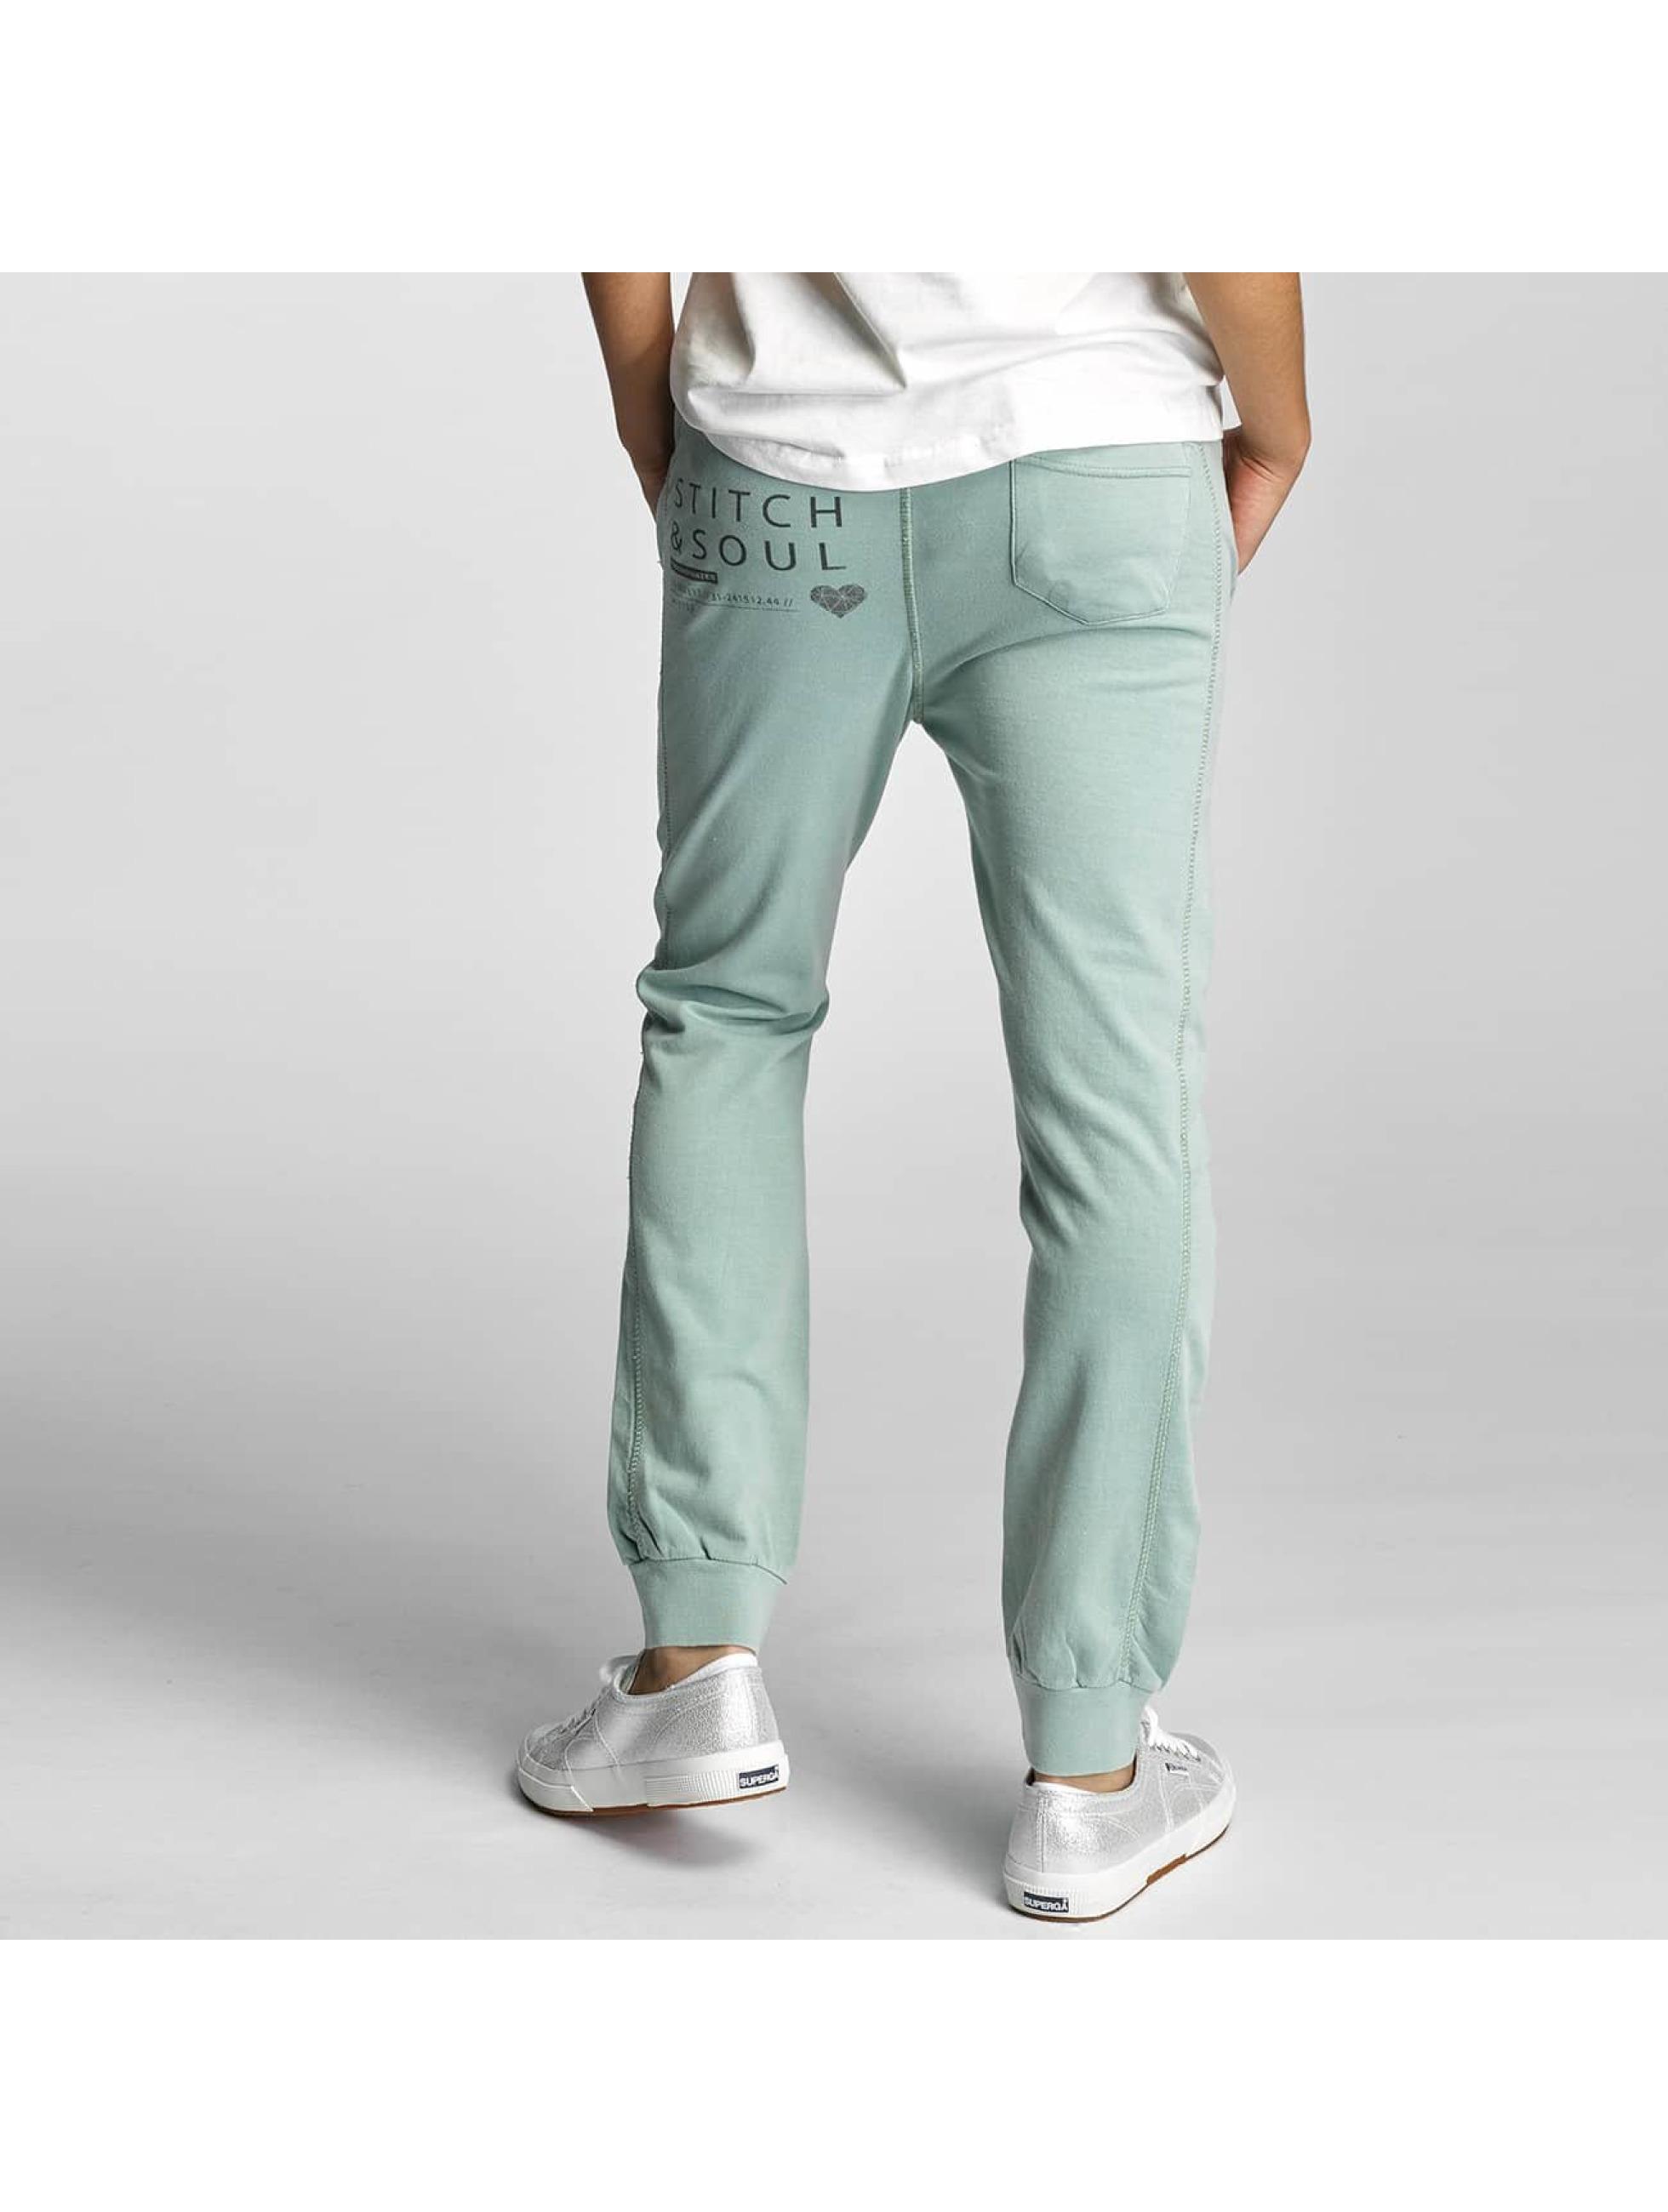 Stitch & Soul Pantalón deportivo Ayda verde